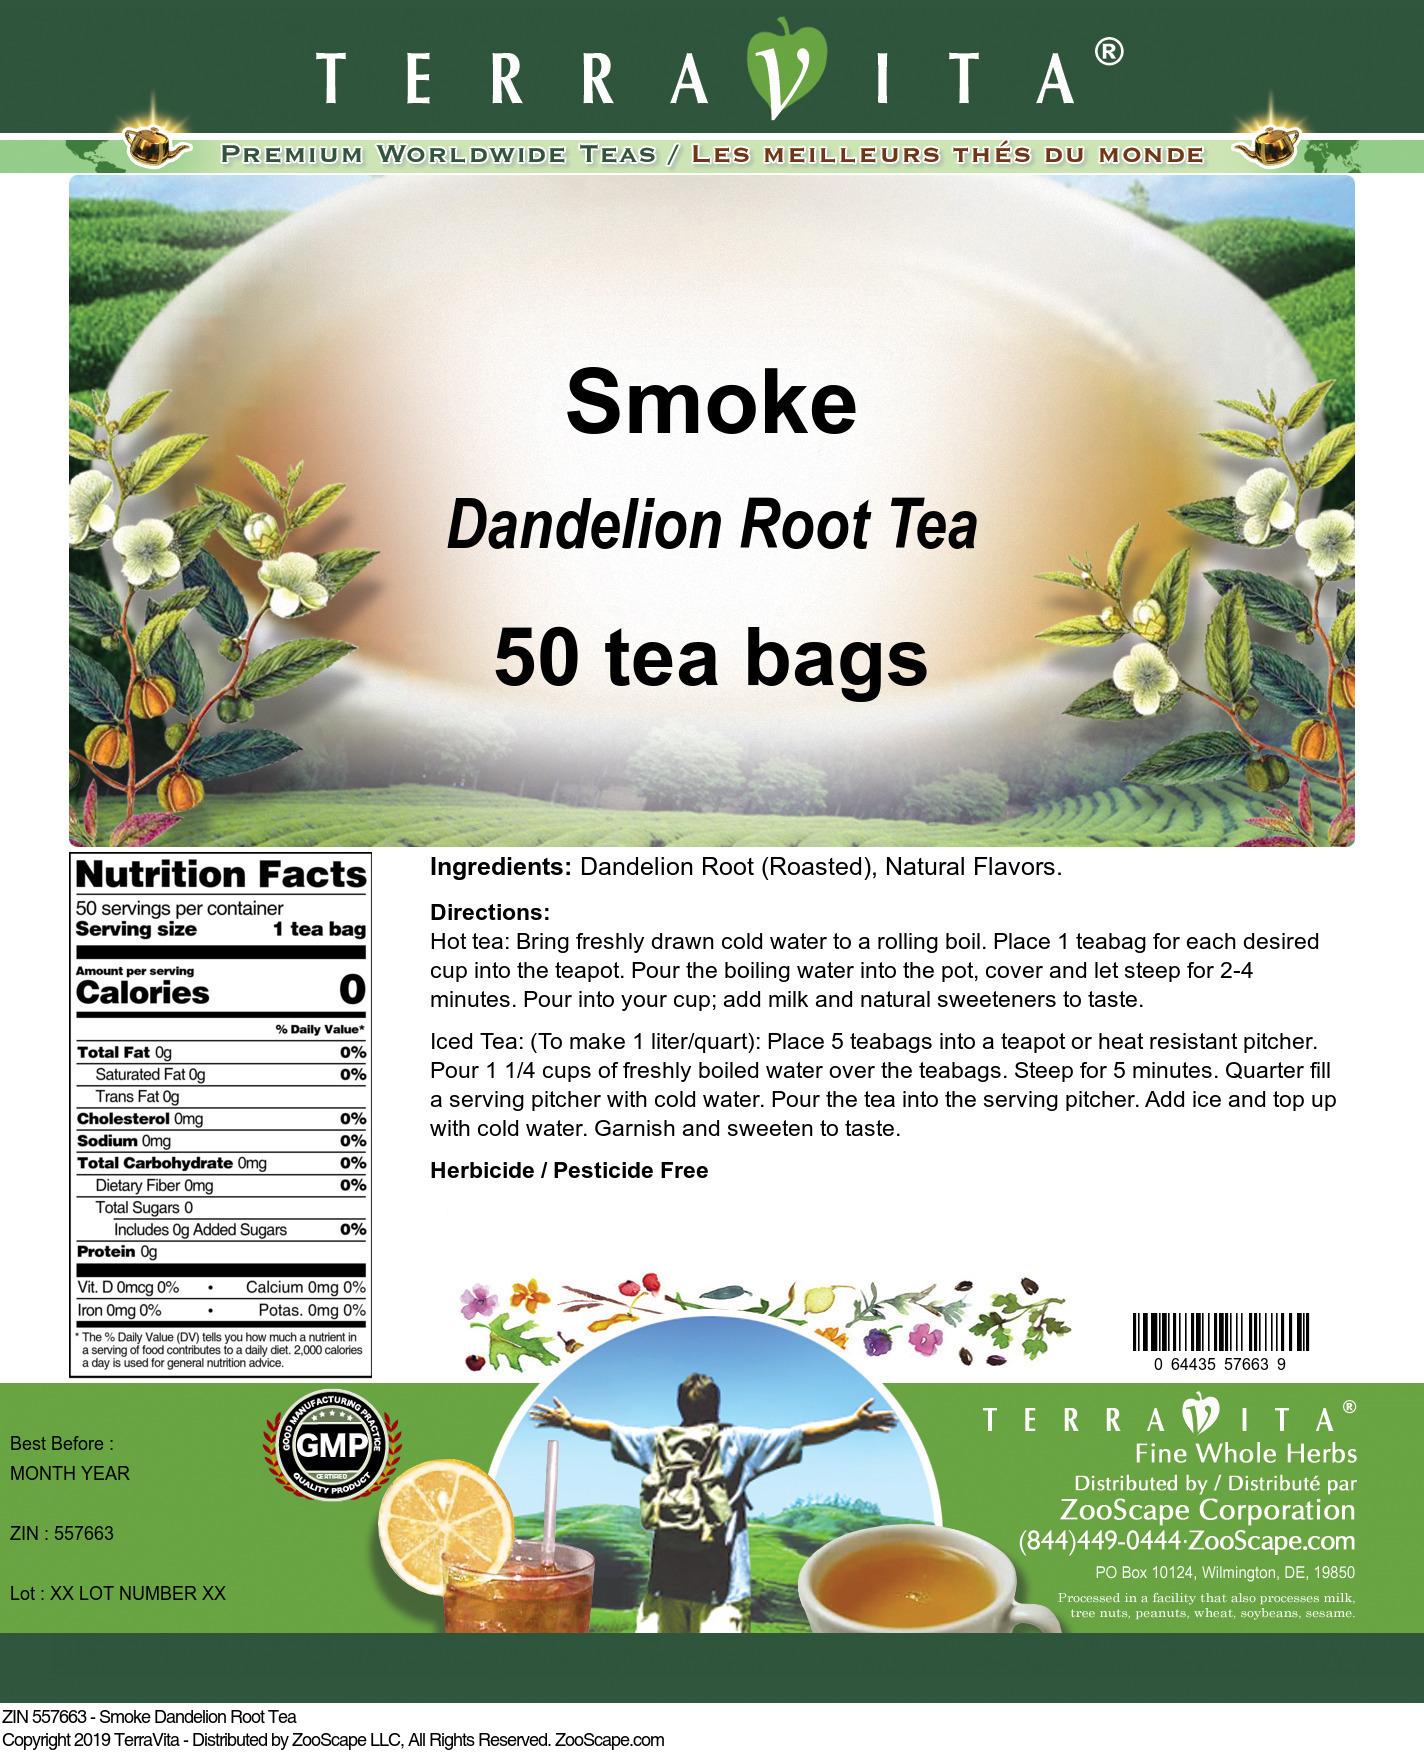 Smoke Dandelion Root Tea